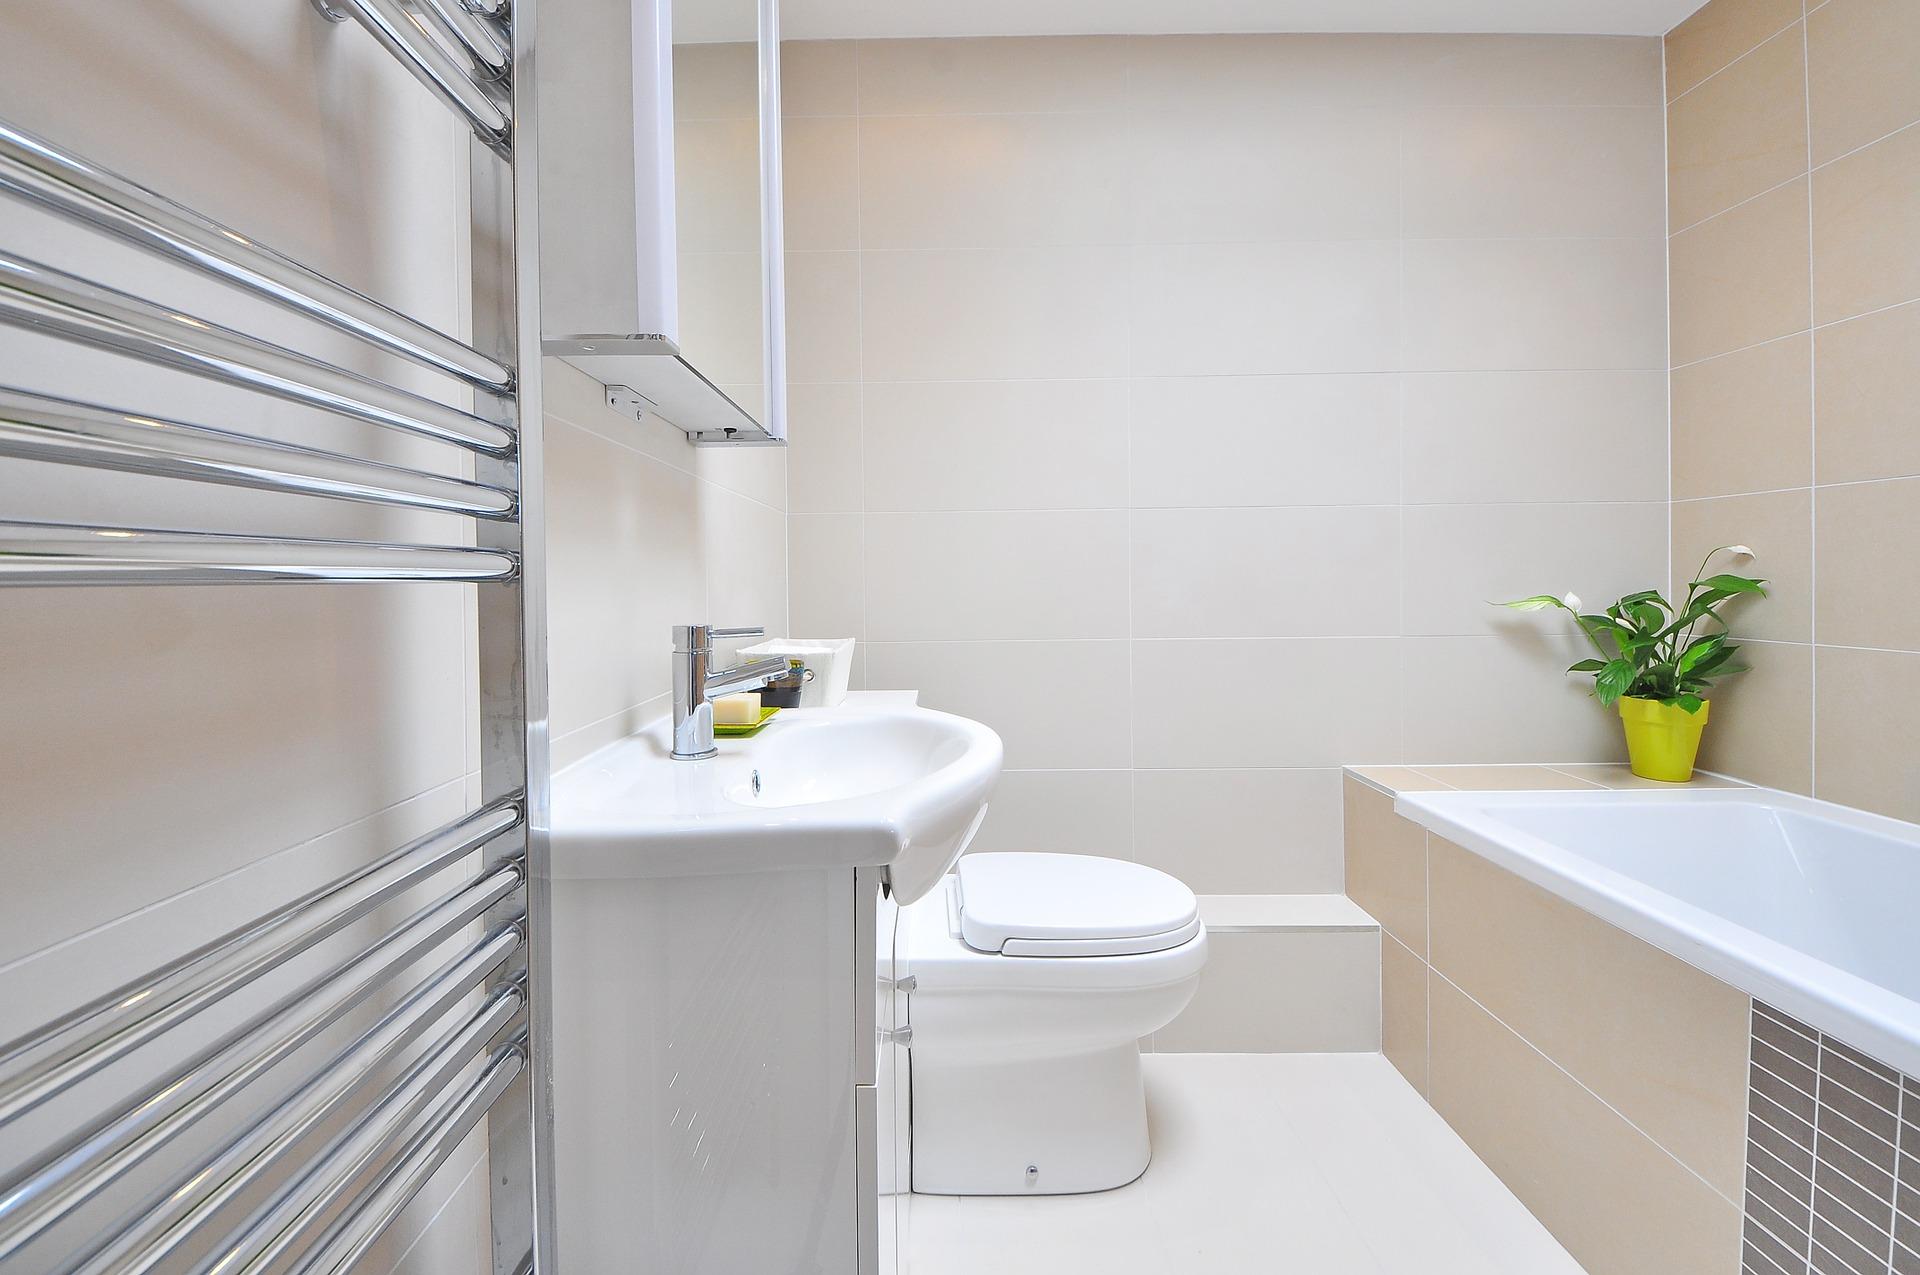 Badezimmer Putzen